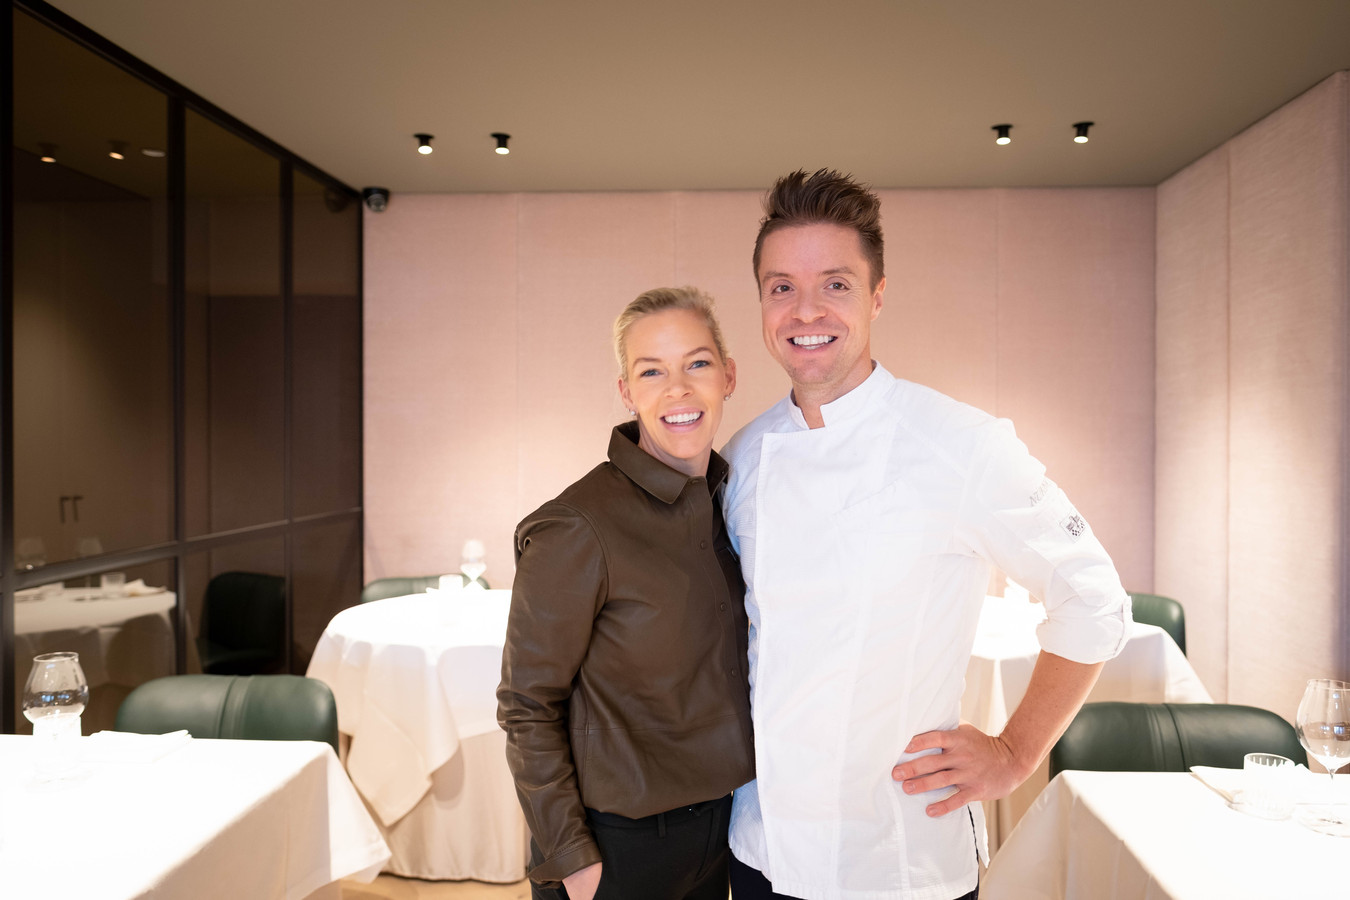 Sofie Willemarck en Thierry Theys